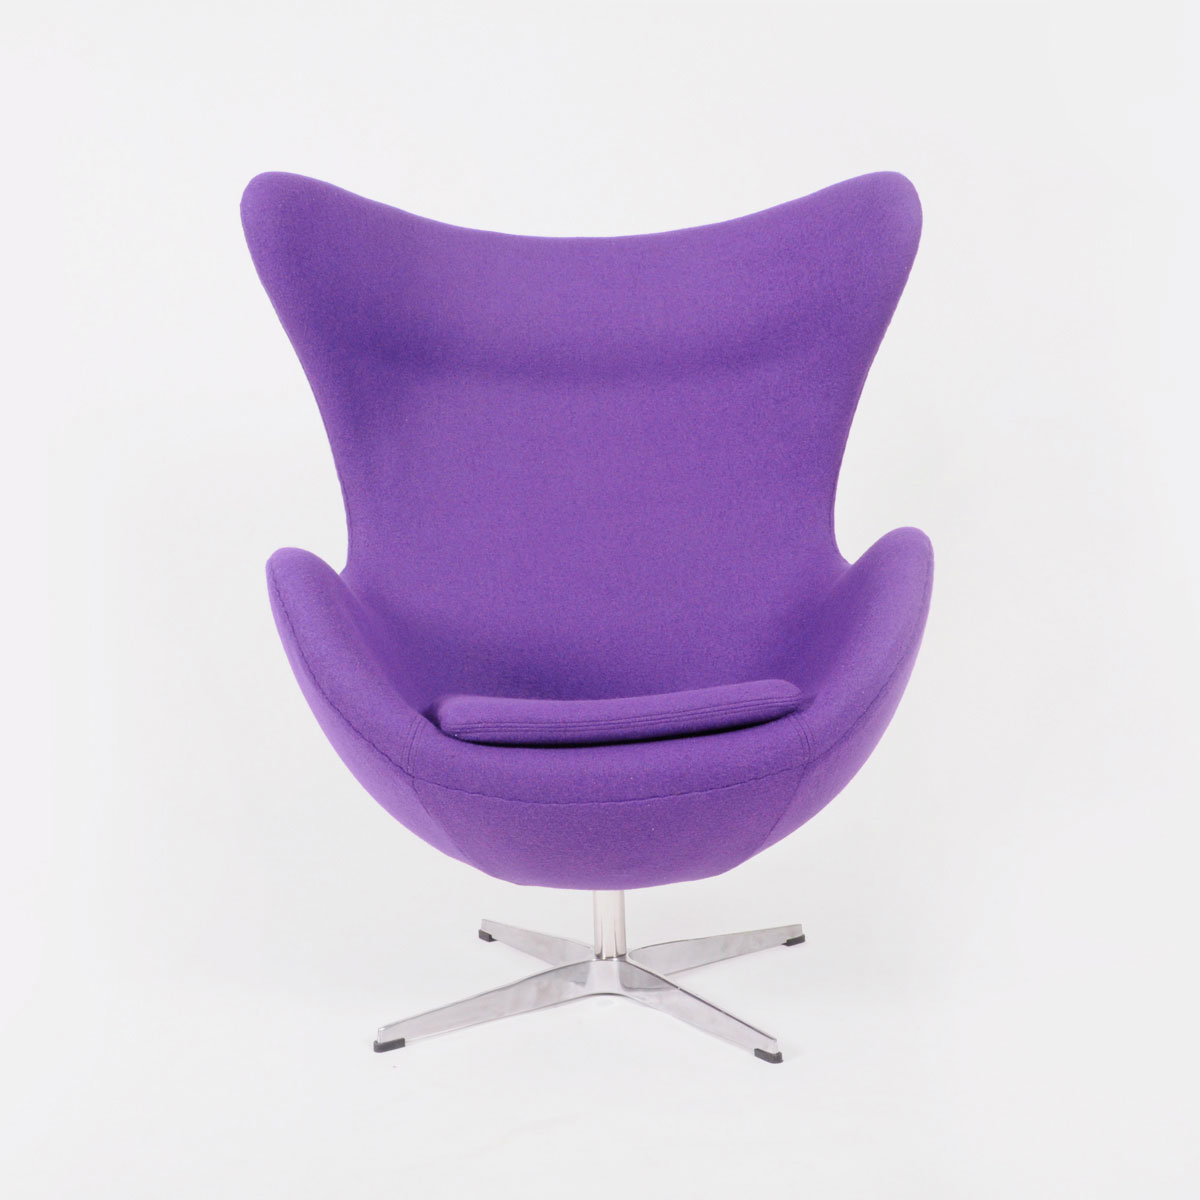 Coffee Shop Leather Sofa Chairs (UL-LE006)